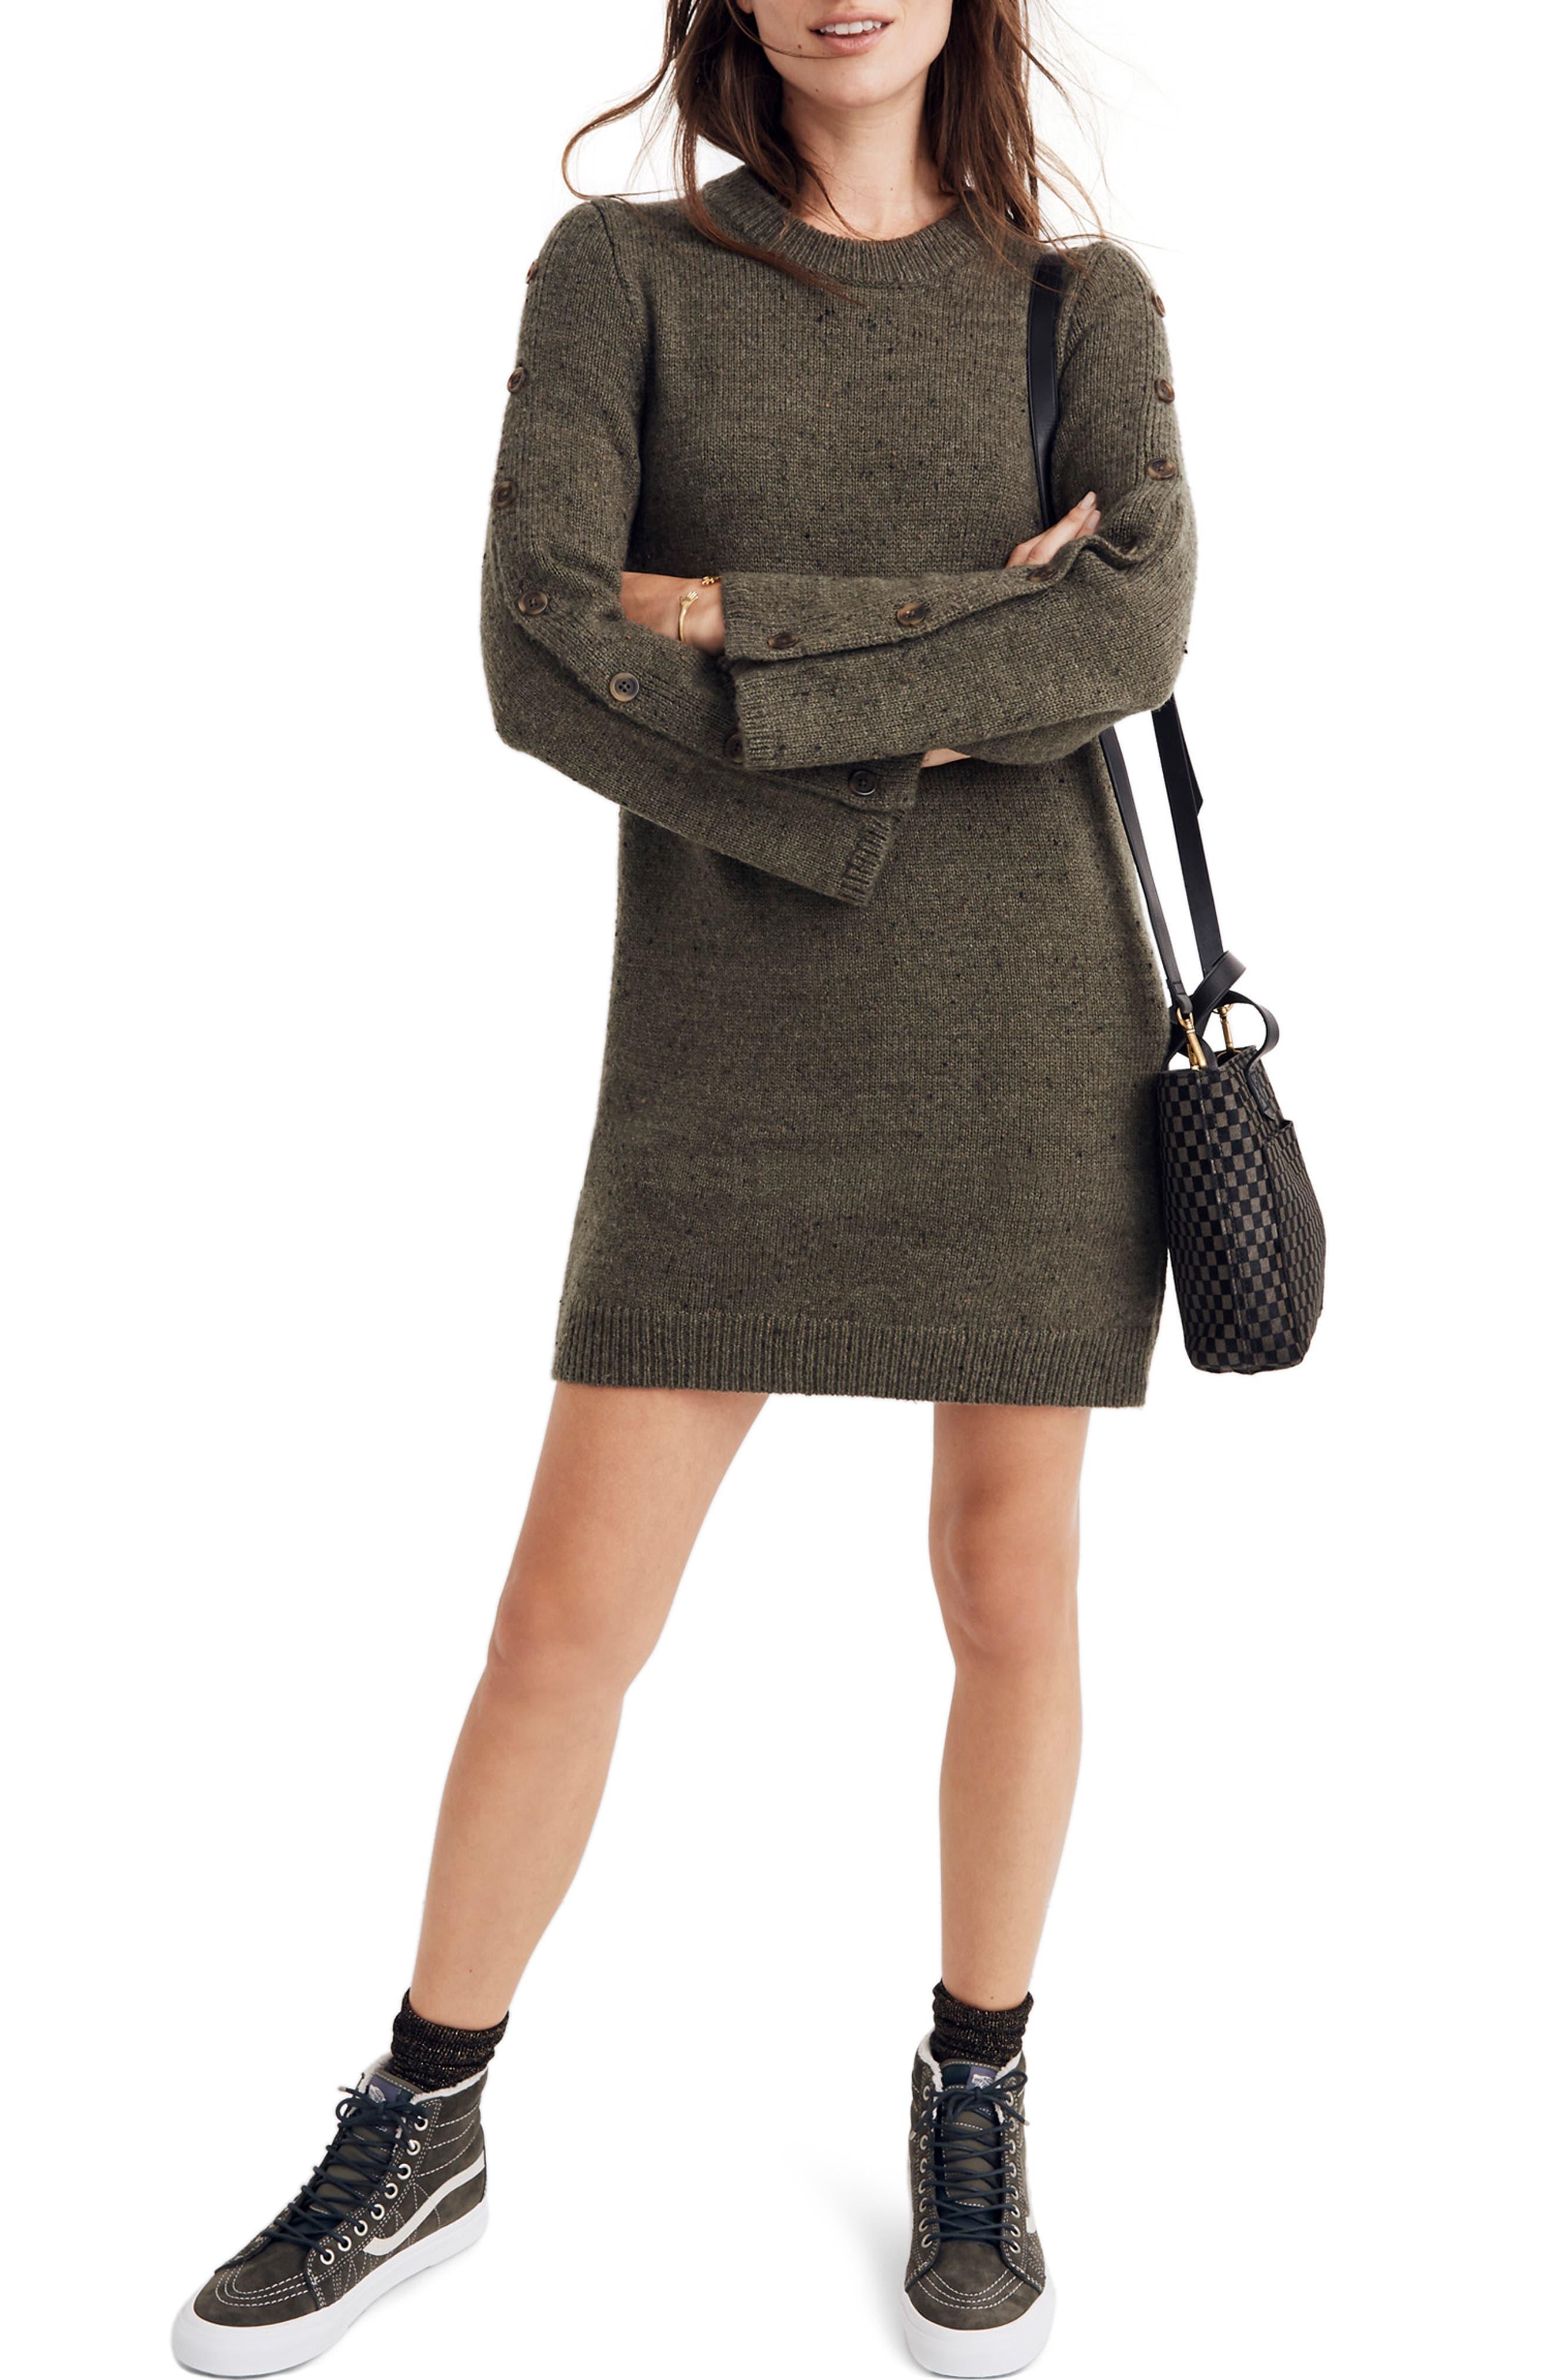 Madewell Donegal Button-Sleeve Sweater Dress, Green